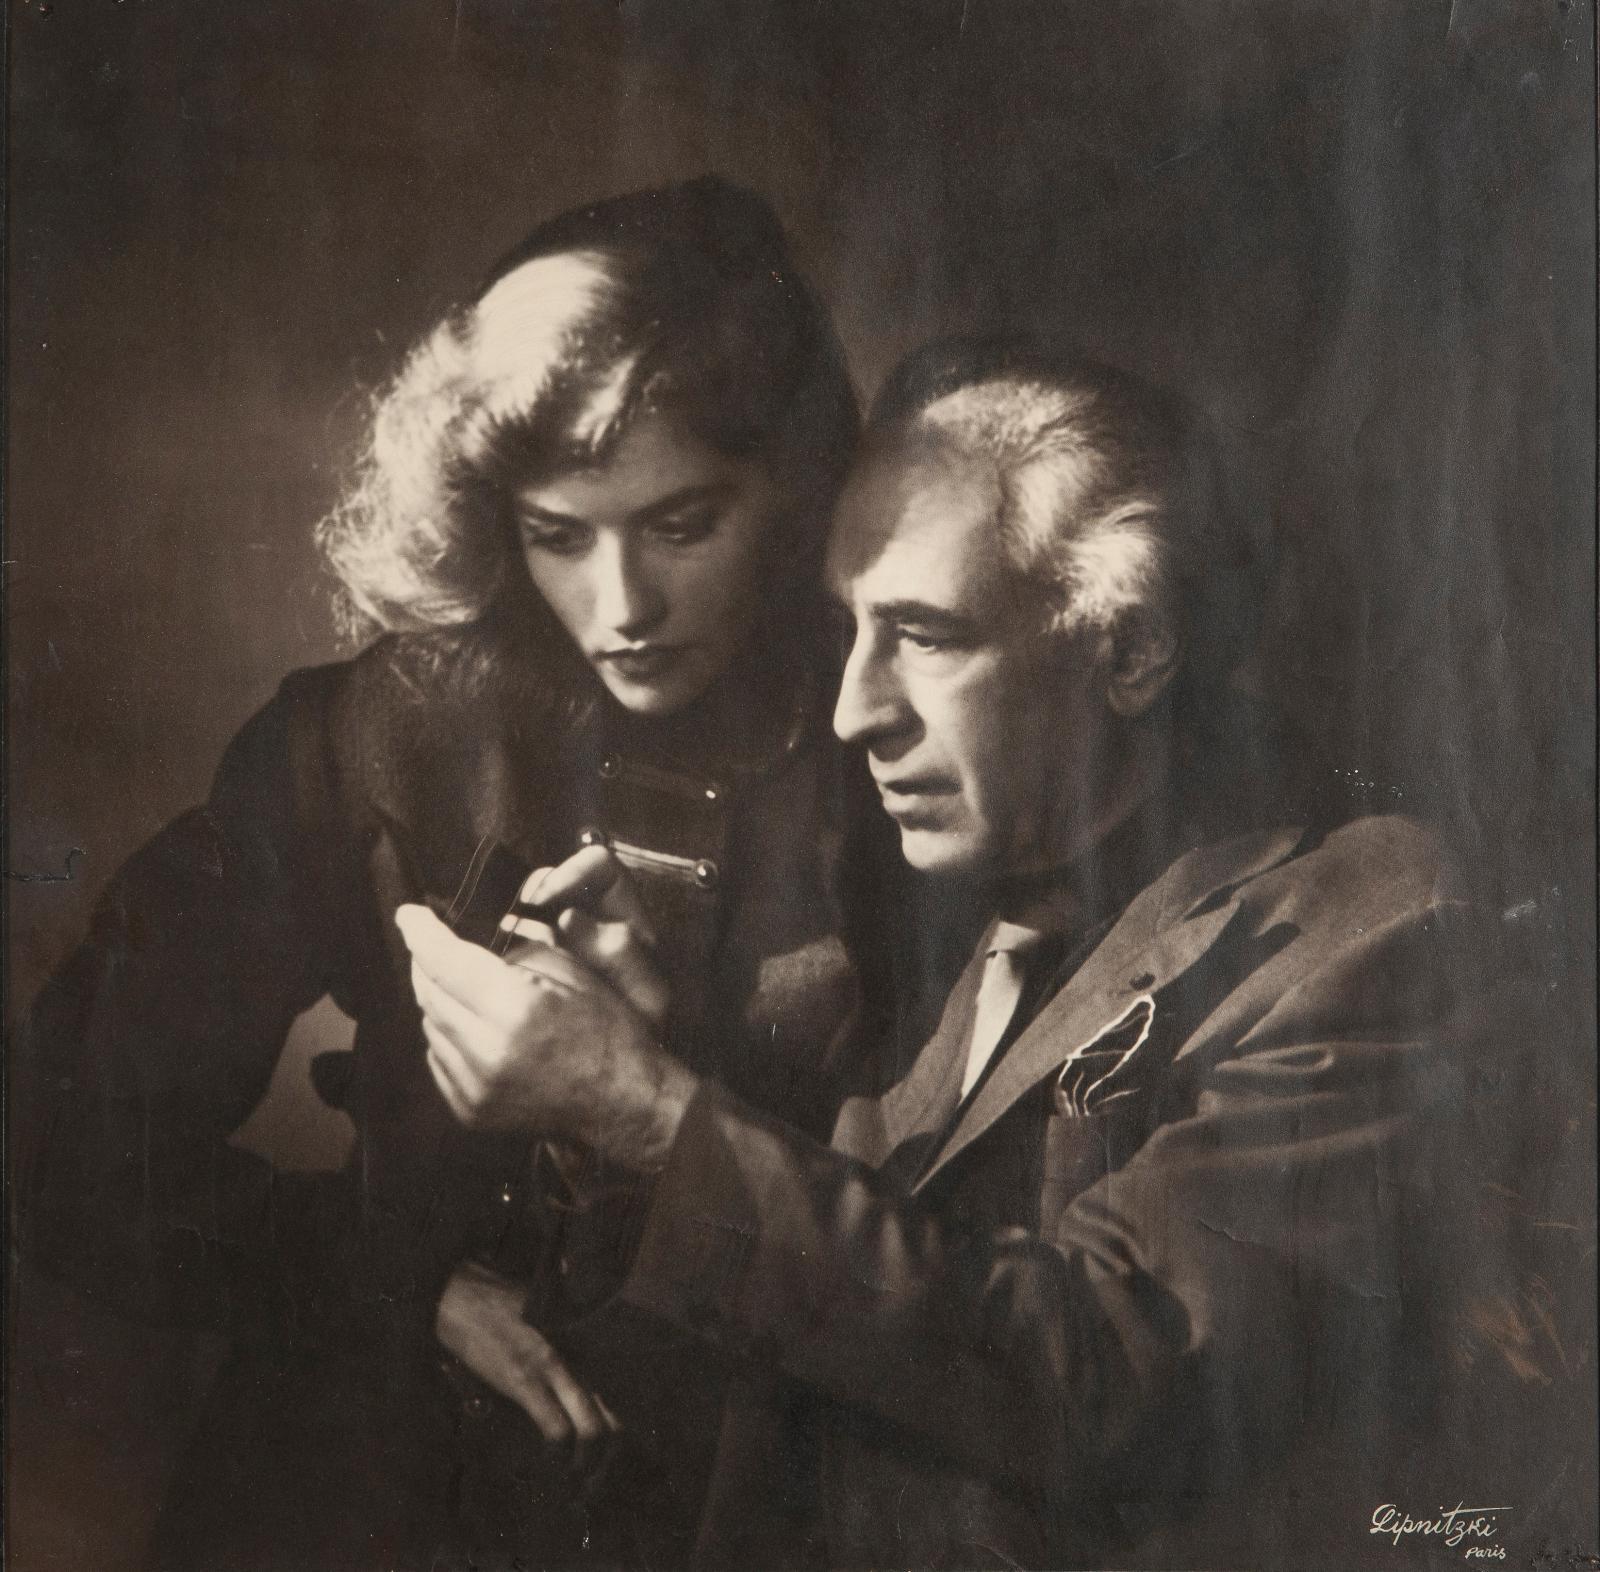 Boris Lipnitzki (1887-1971), Abel Gance et Nelly Kaplan, agence Roger-Viollet, photographie. Estimation: 150/200€